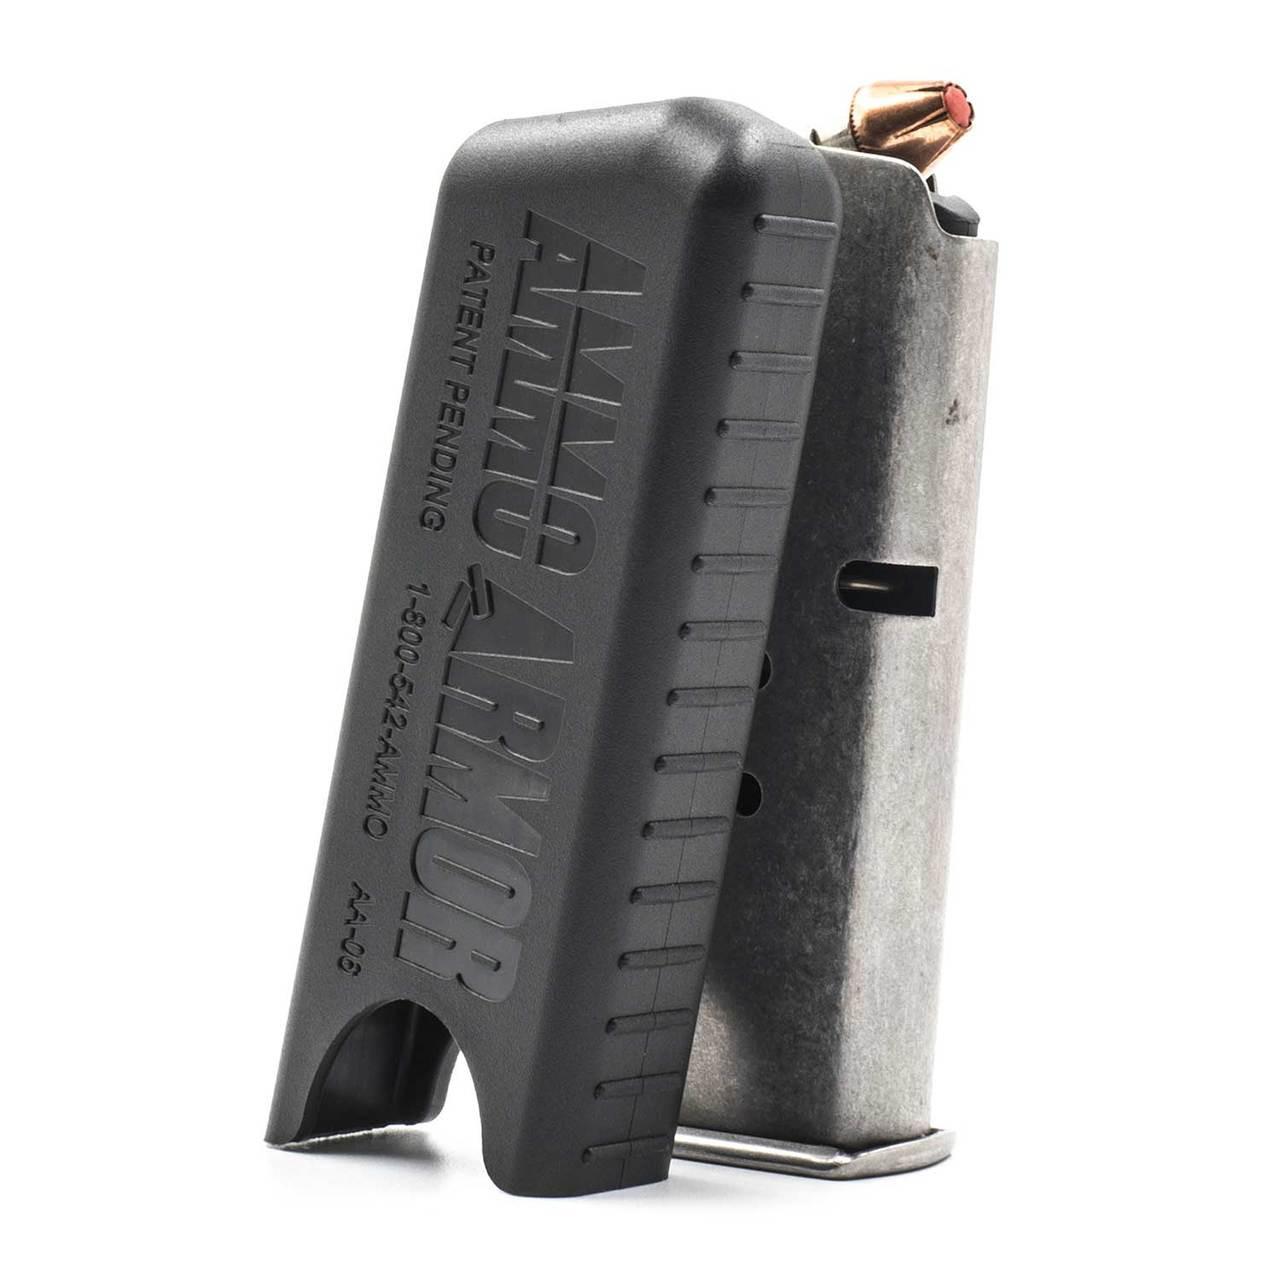 Keltec P32 Ammo Armor